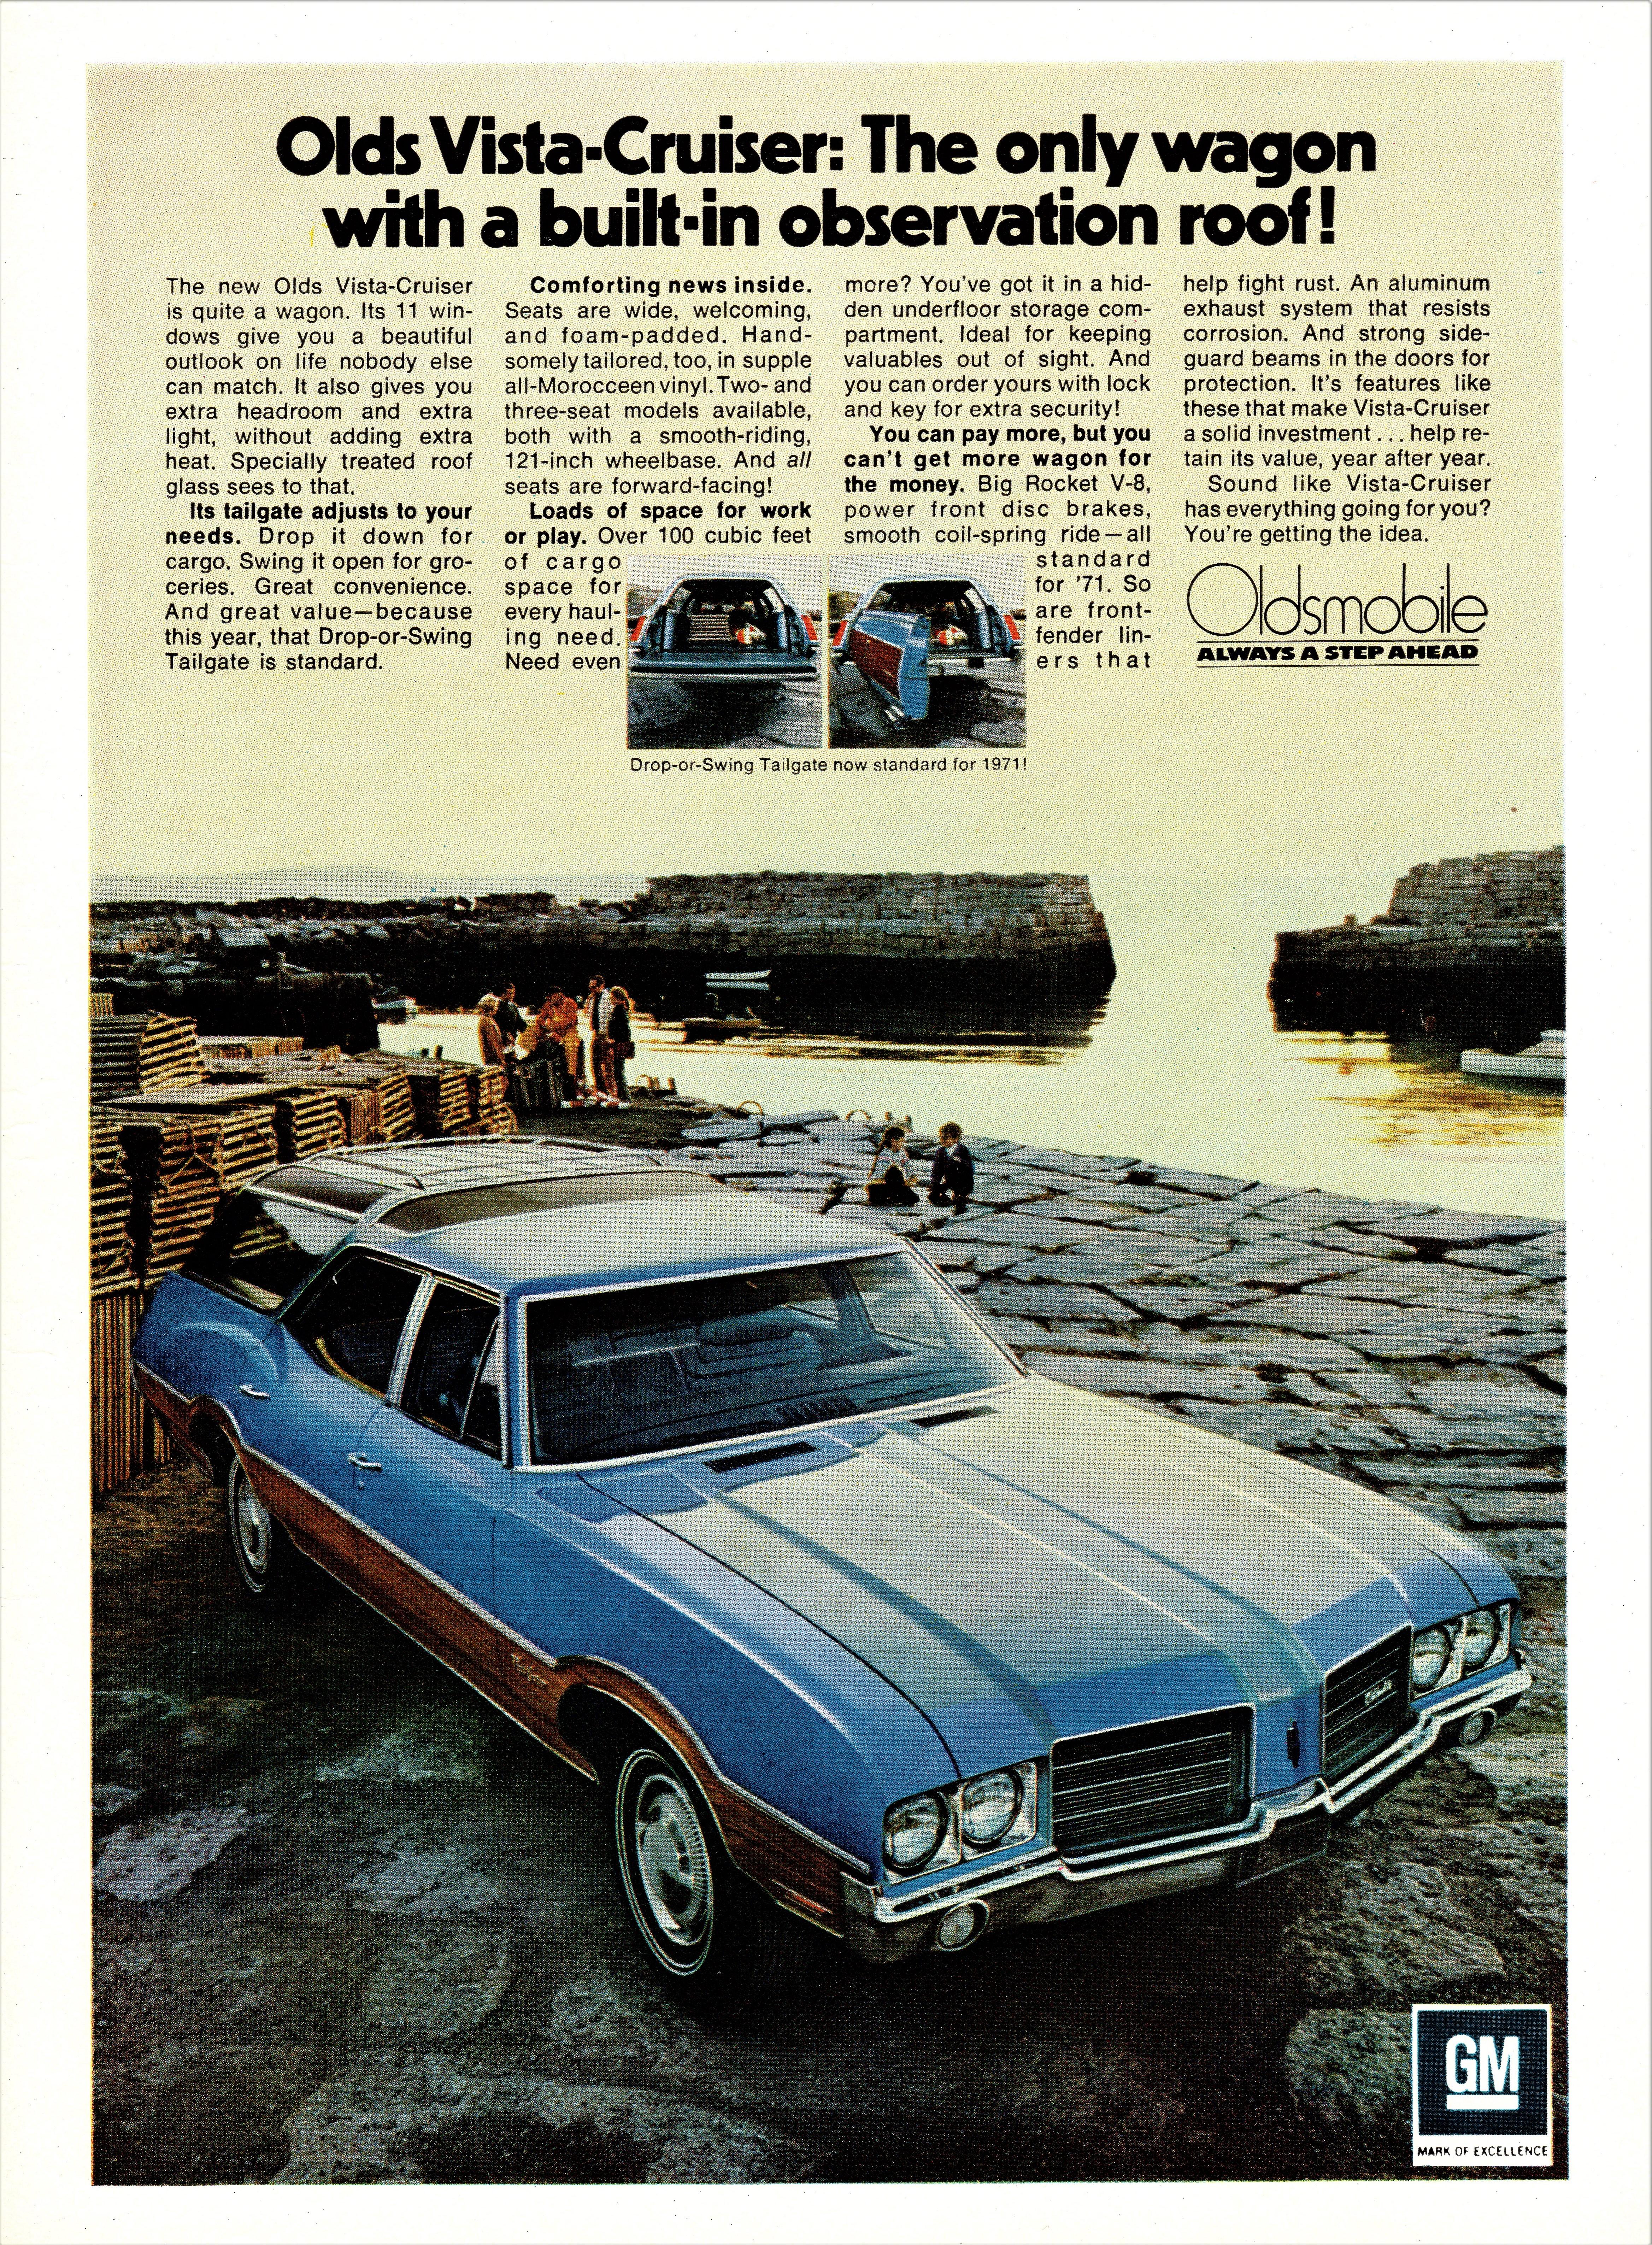 1971 Oldsmobile Vista-Cruiser